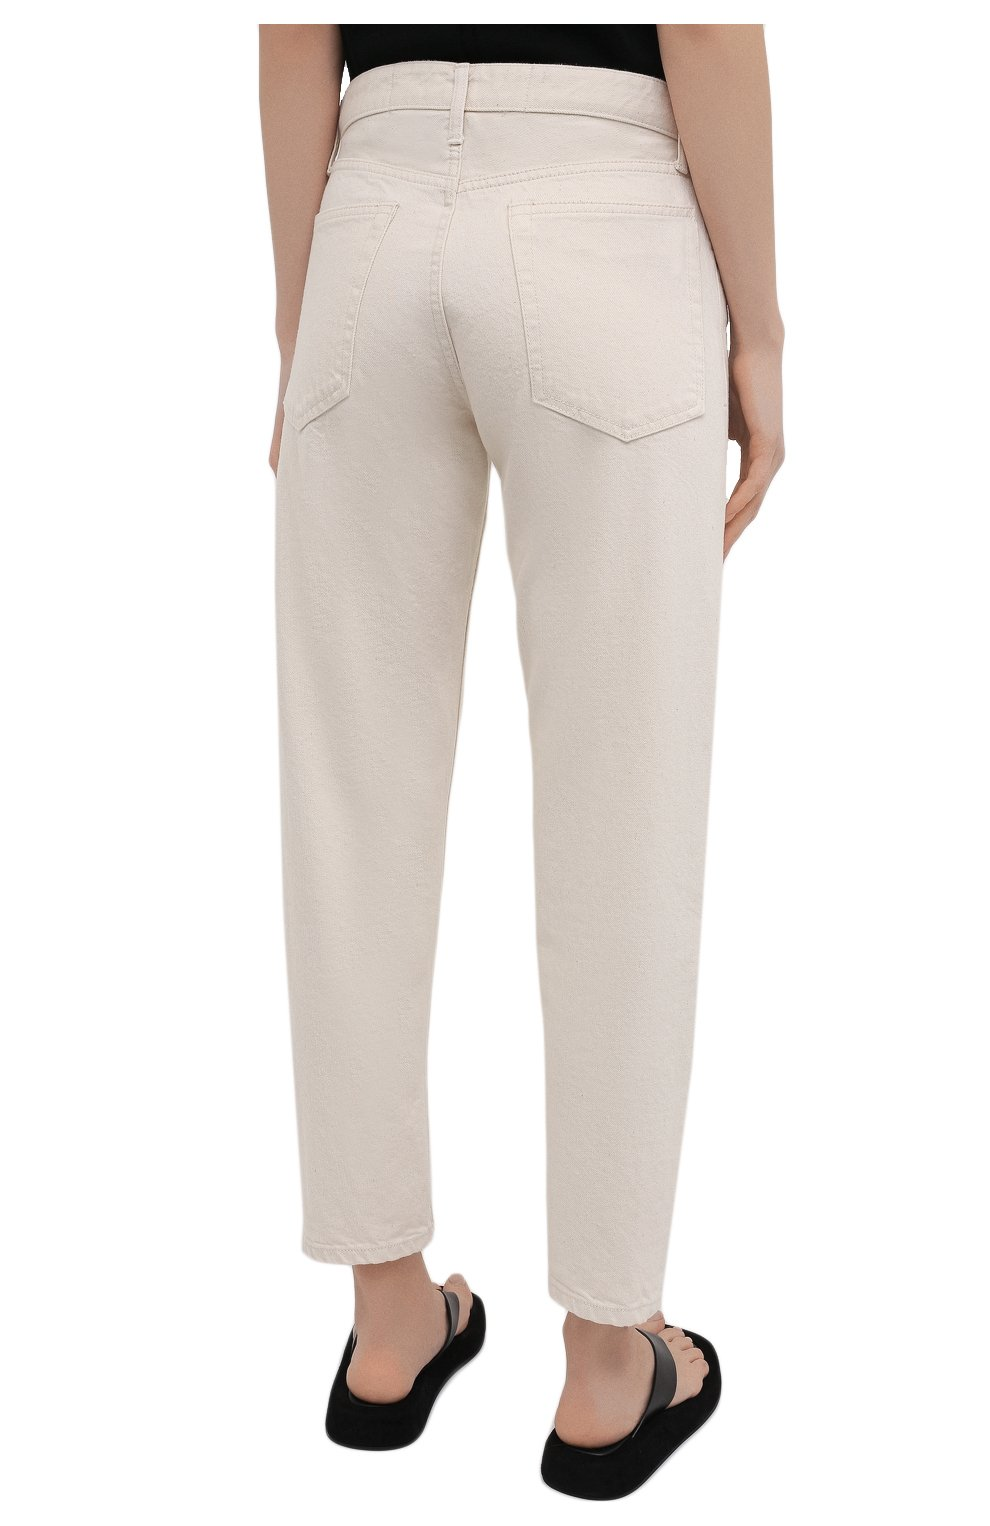 Женские джинсы JIL SANDER бежевого цвета, арт. JPPS663107-WS246500 | Фото 4